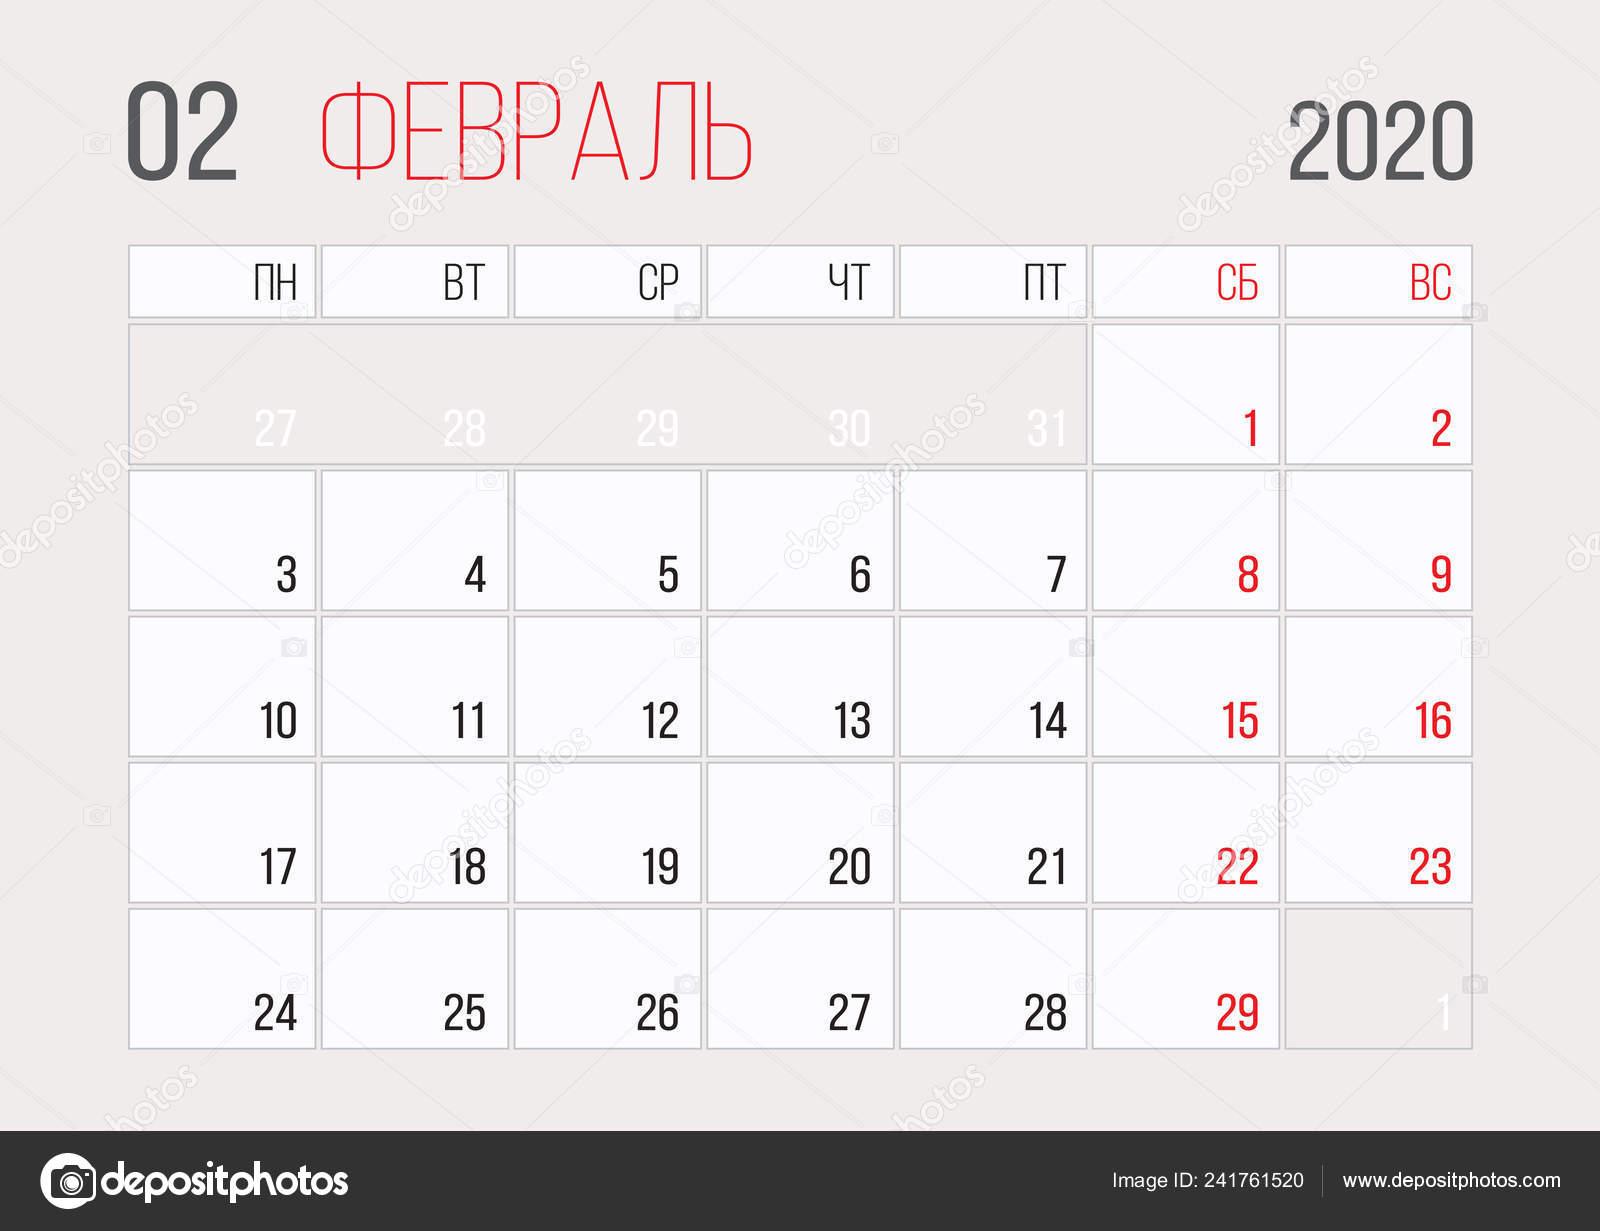 Febrero 2020 Calendario.Diseno Plantilla Corporativa Planner Ruso 2020 Calendario Mes